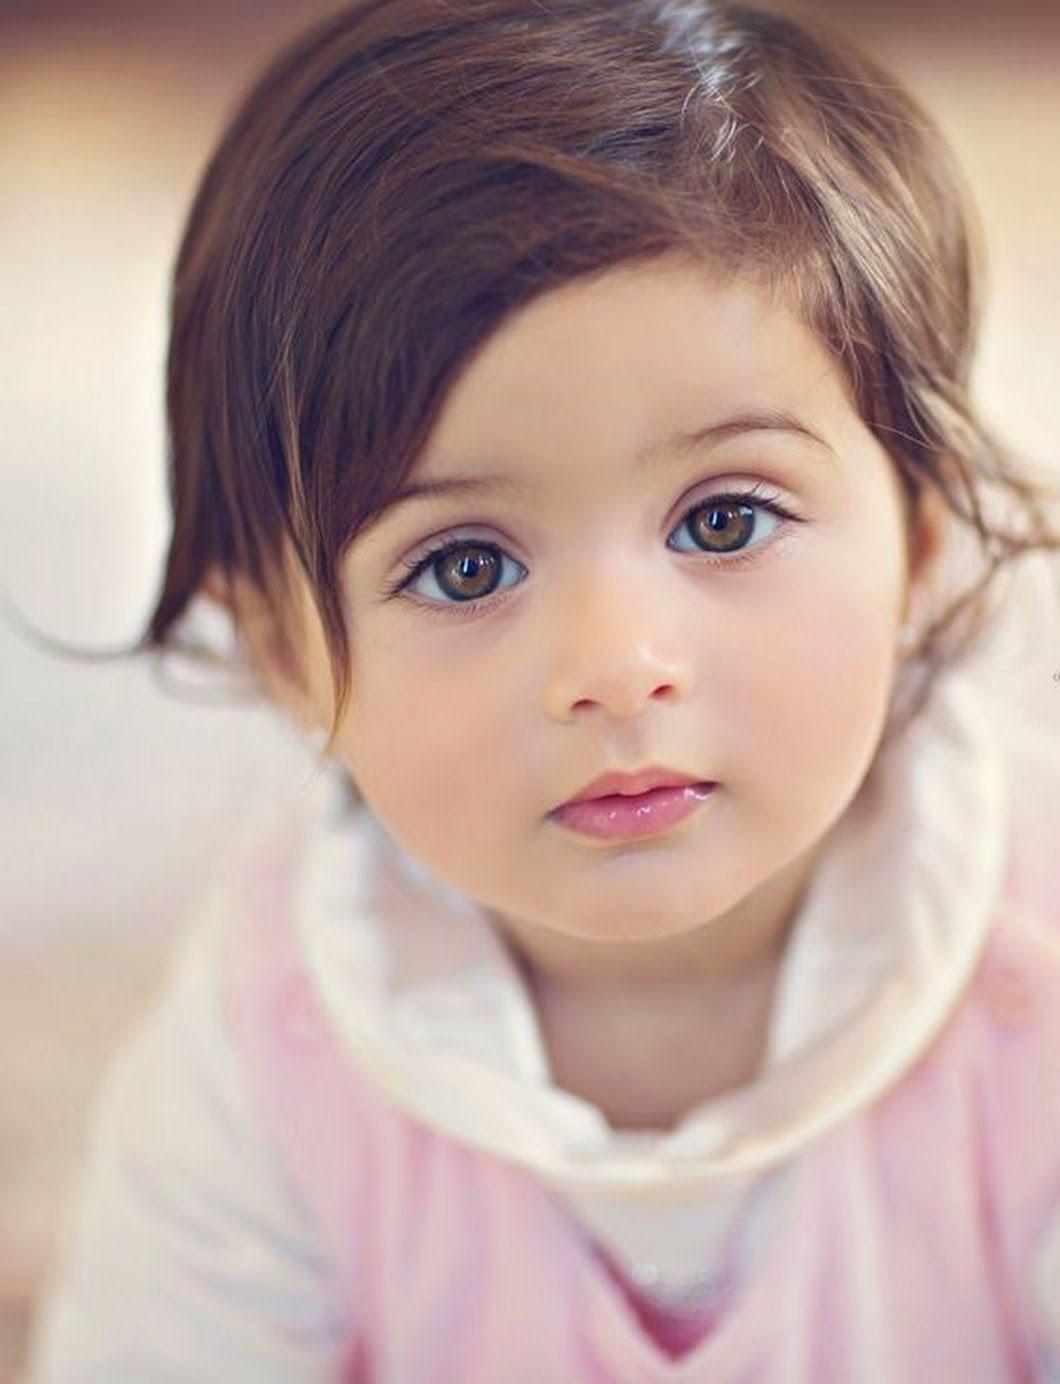 Stylish Baby Boy Whatsapp Dp Images pics download